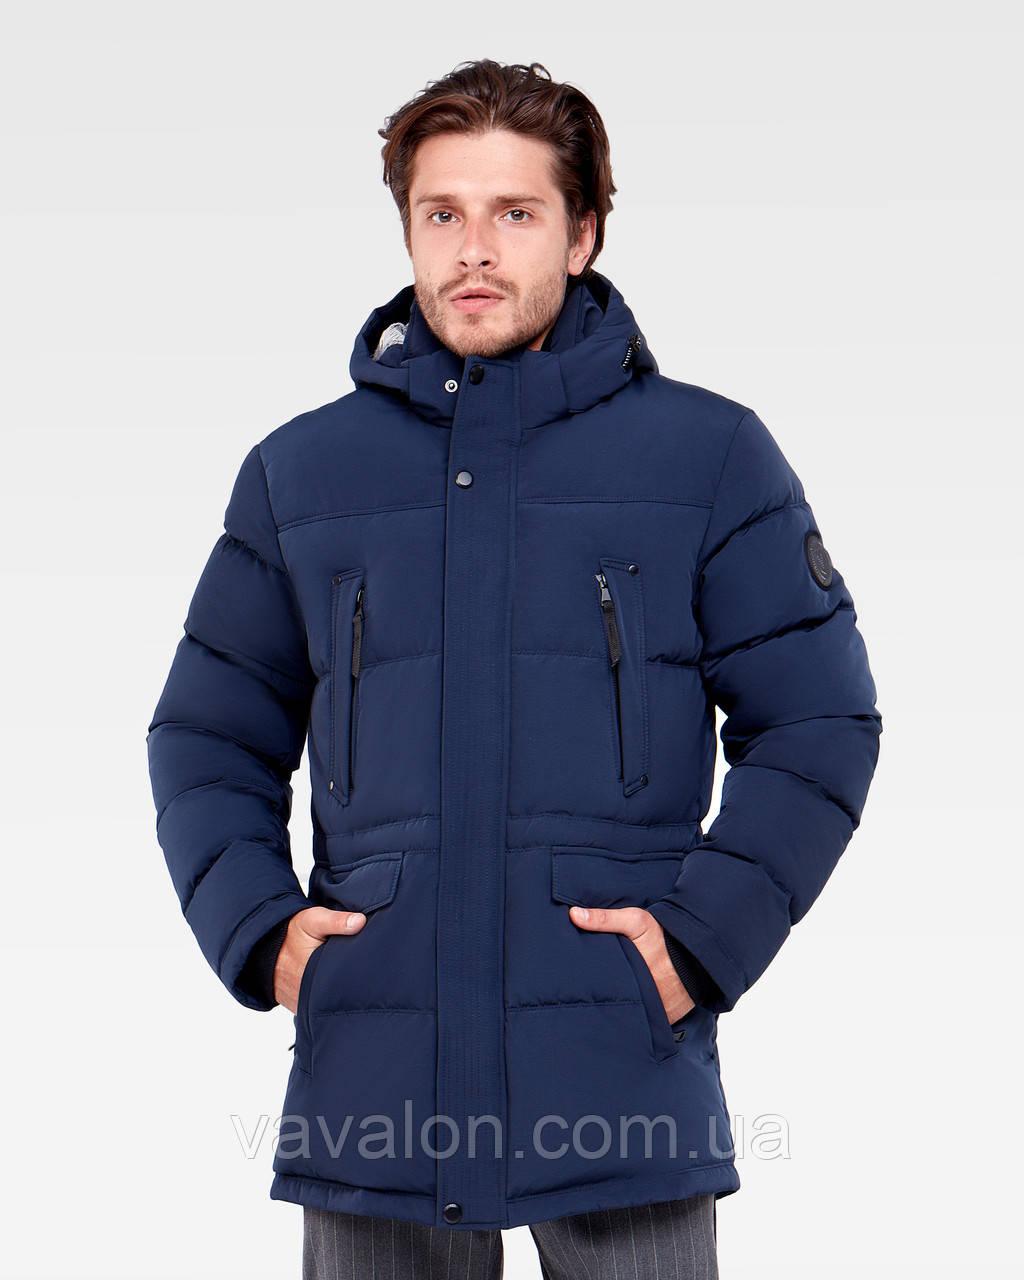 Зимняя мужская куртка Vavalon KZ-P904 navy